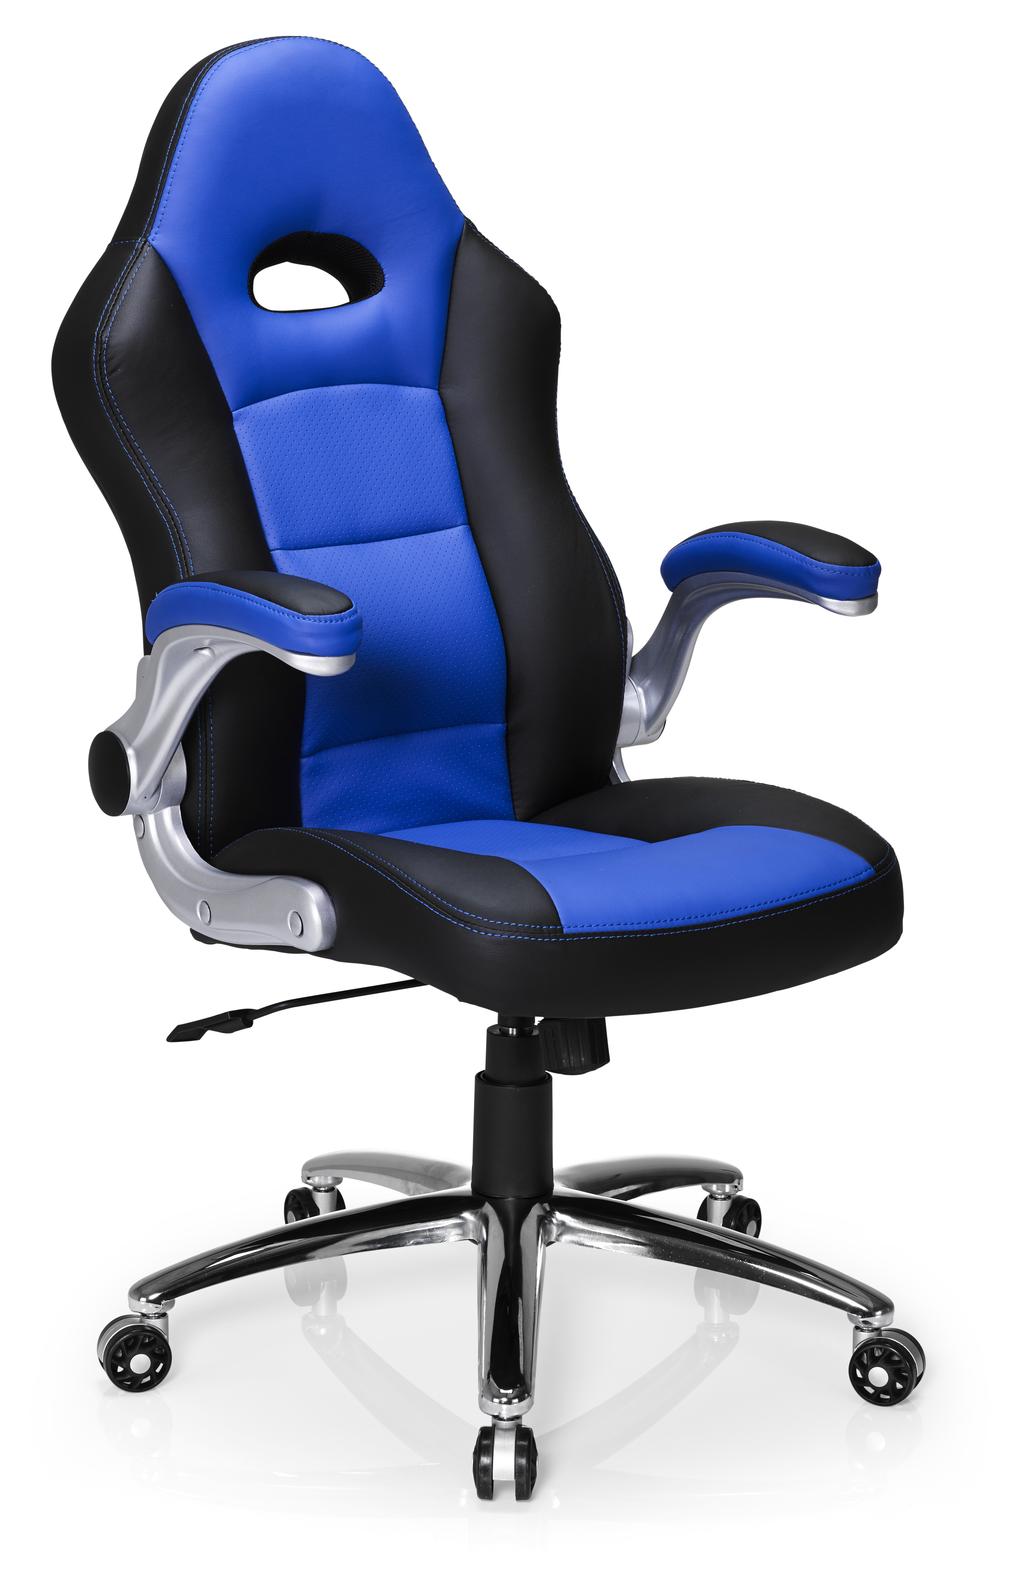 Hummingbird Le Mans Racer Chair Black And Blue